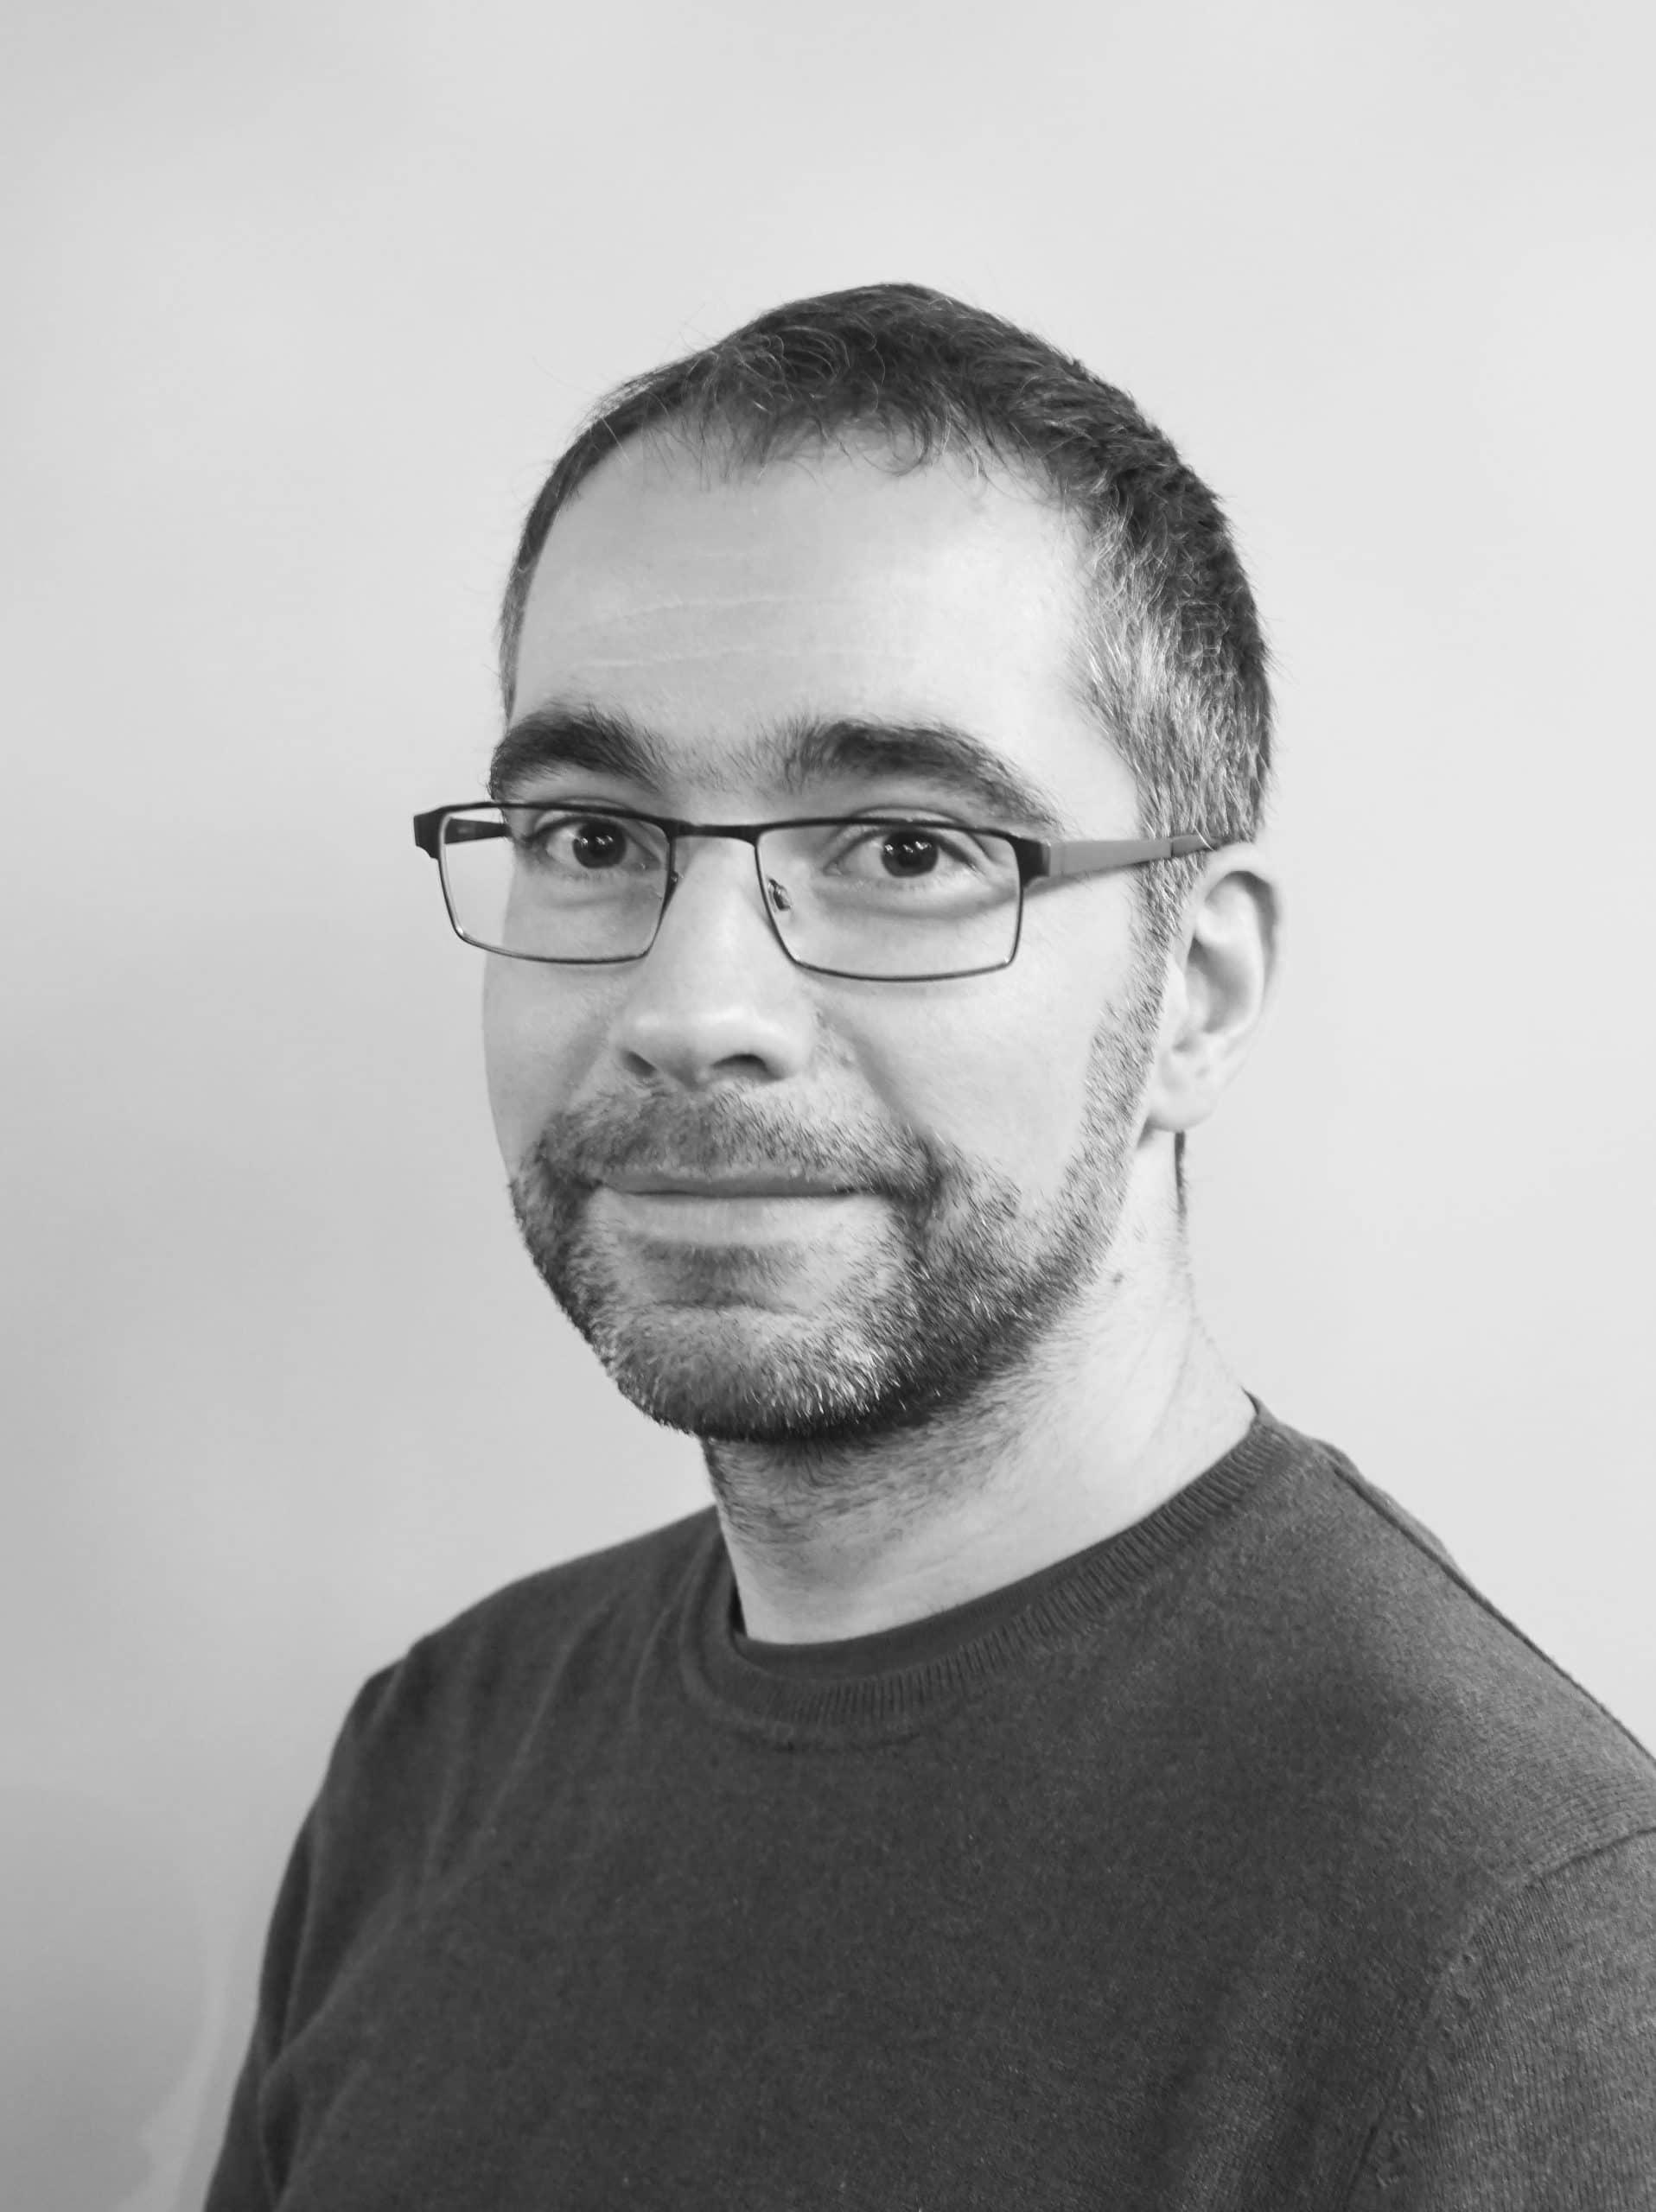 Nicolas développeur full stack velco